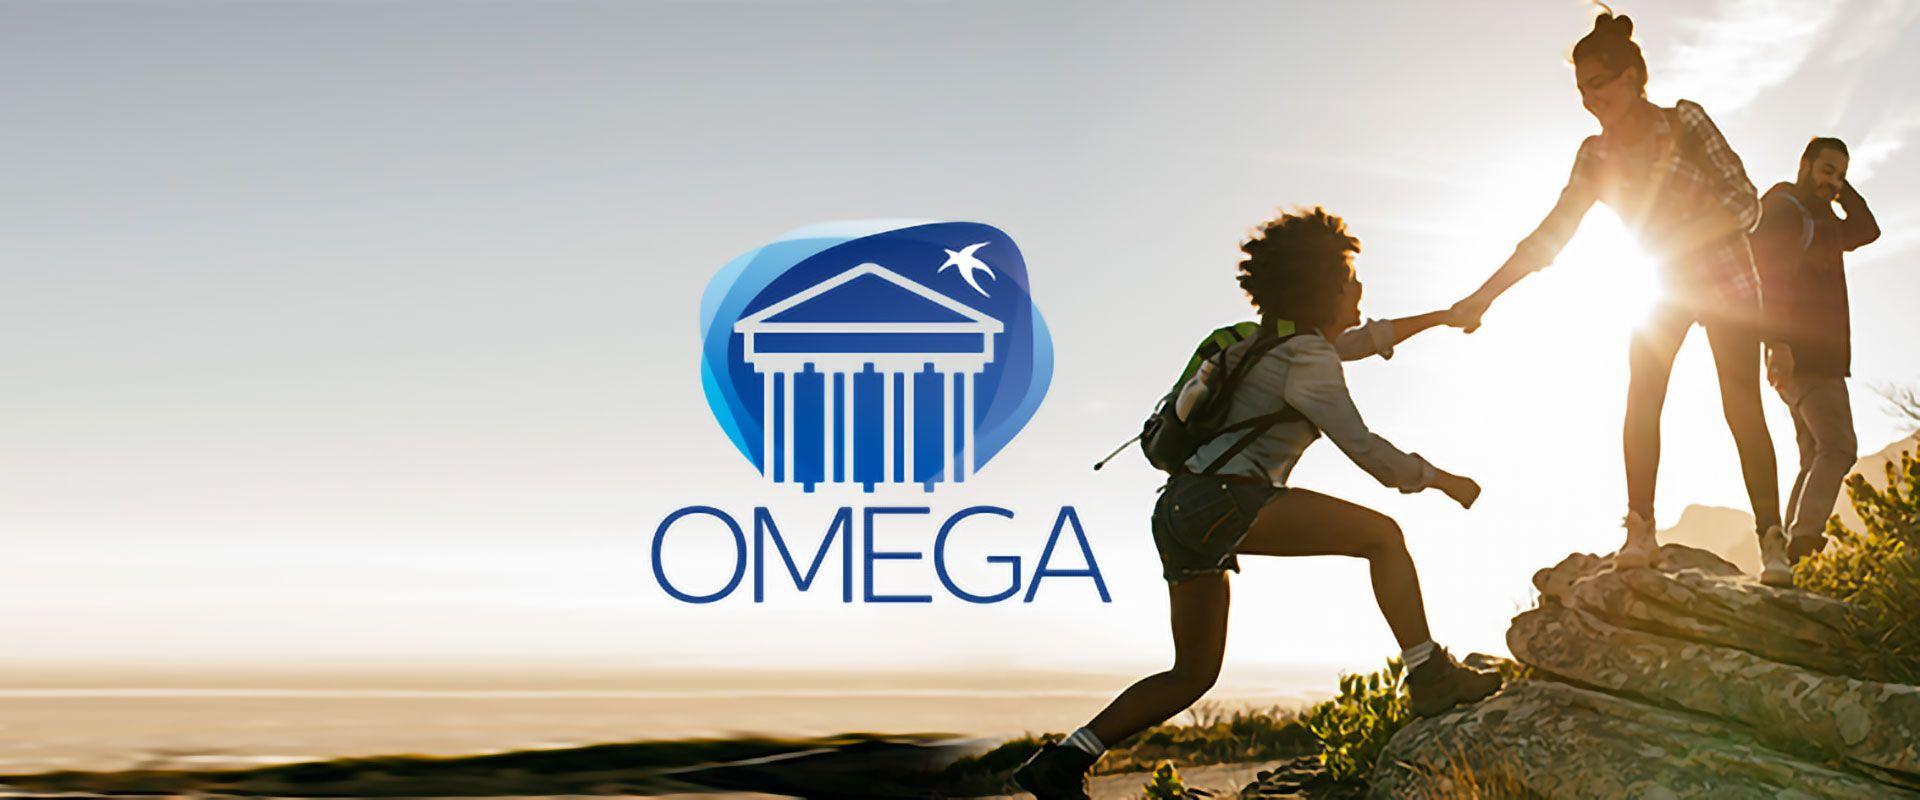 rivista omega